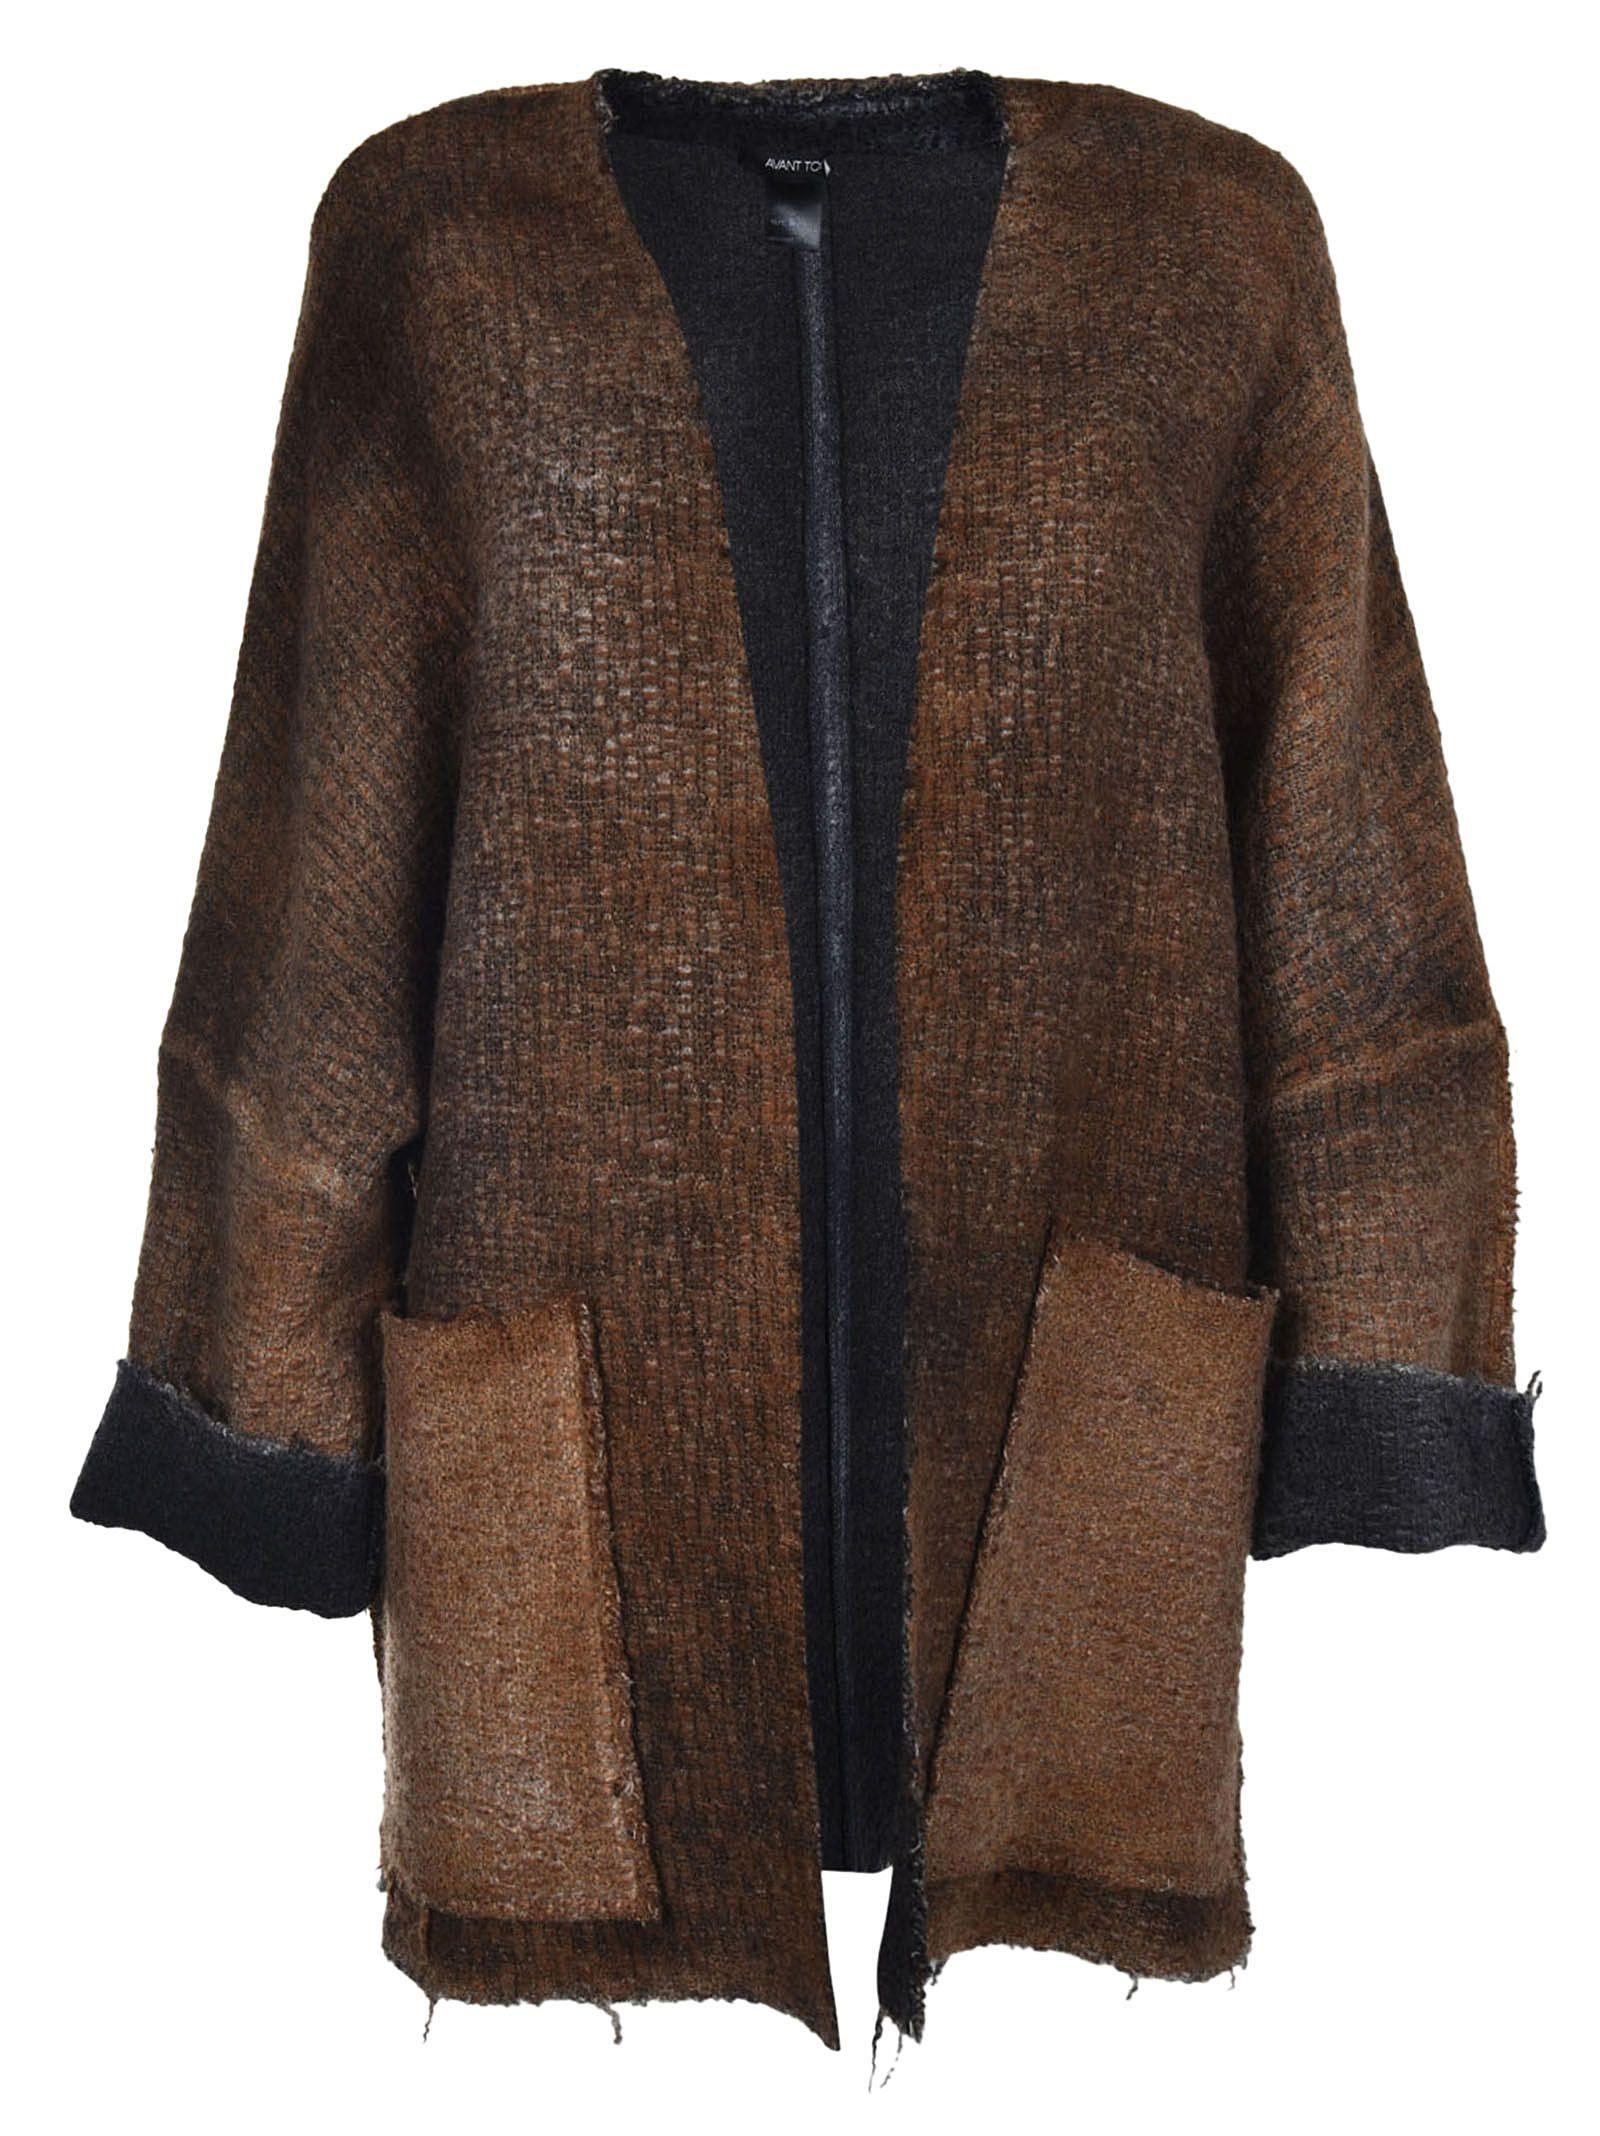 Avant Toi - Avant Toi Kimono Sleeved Cardigan - Brown, Women's ...